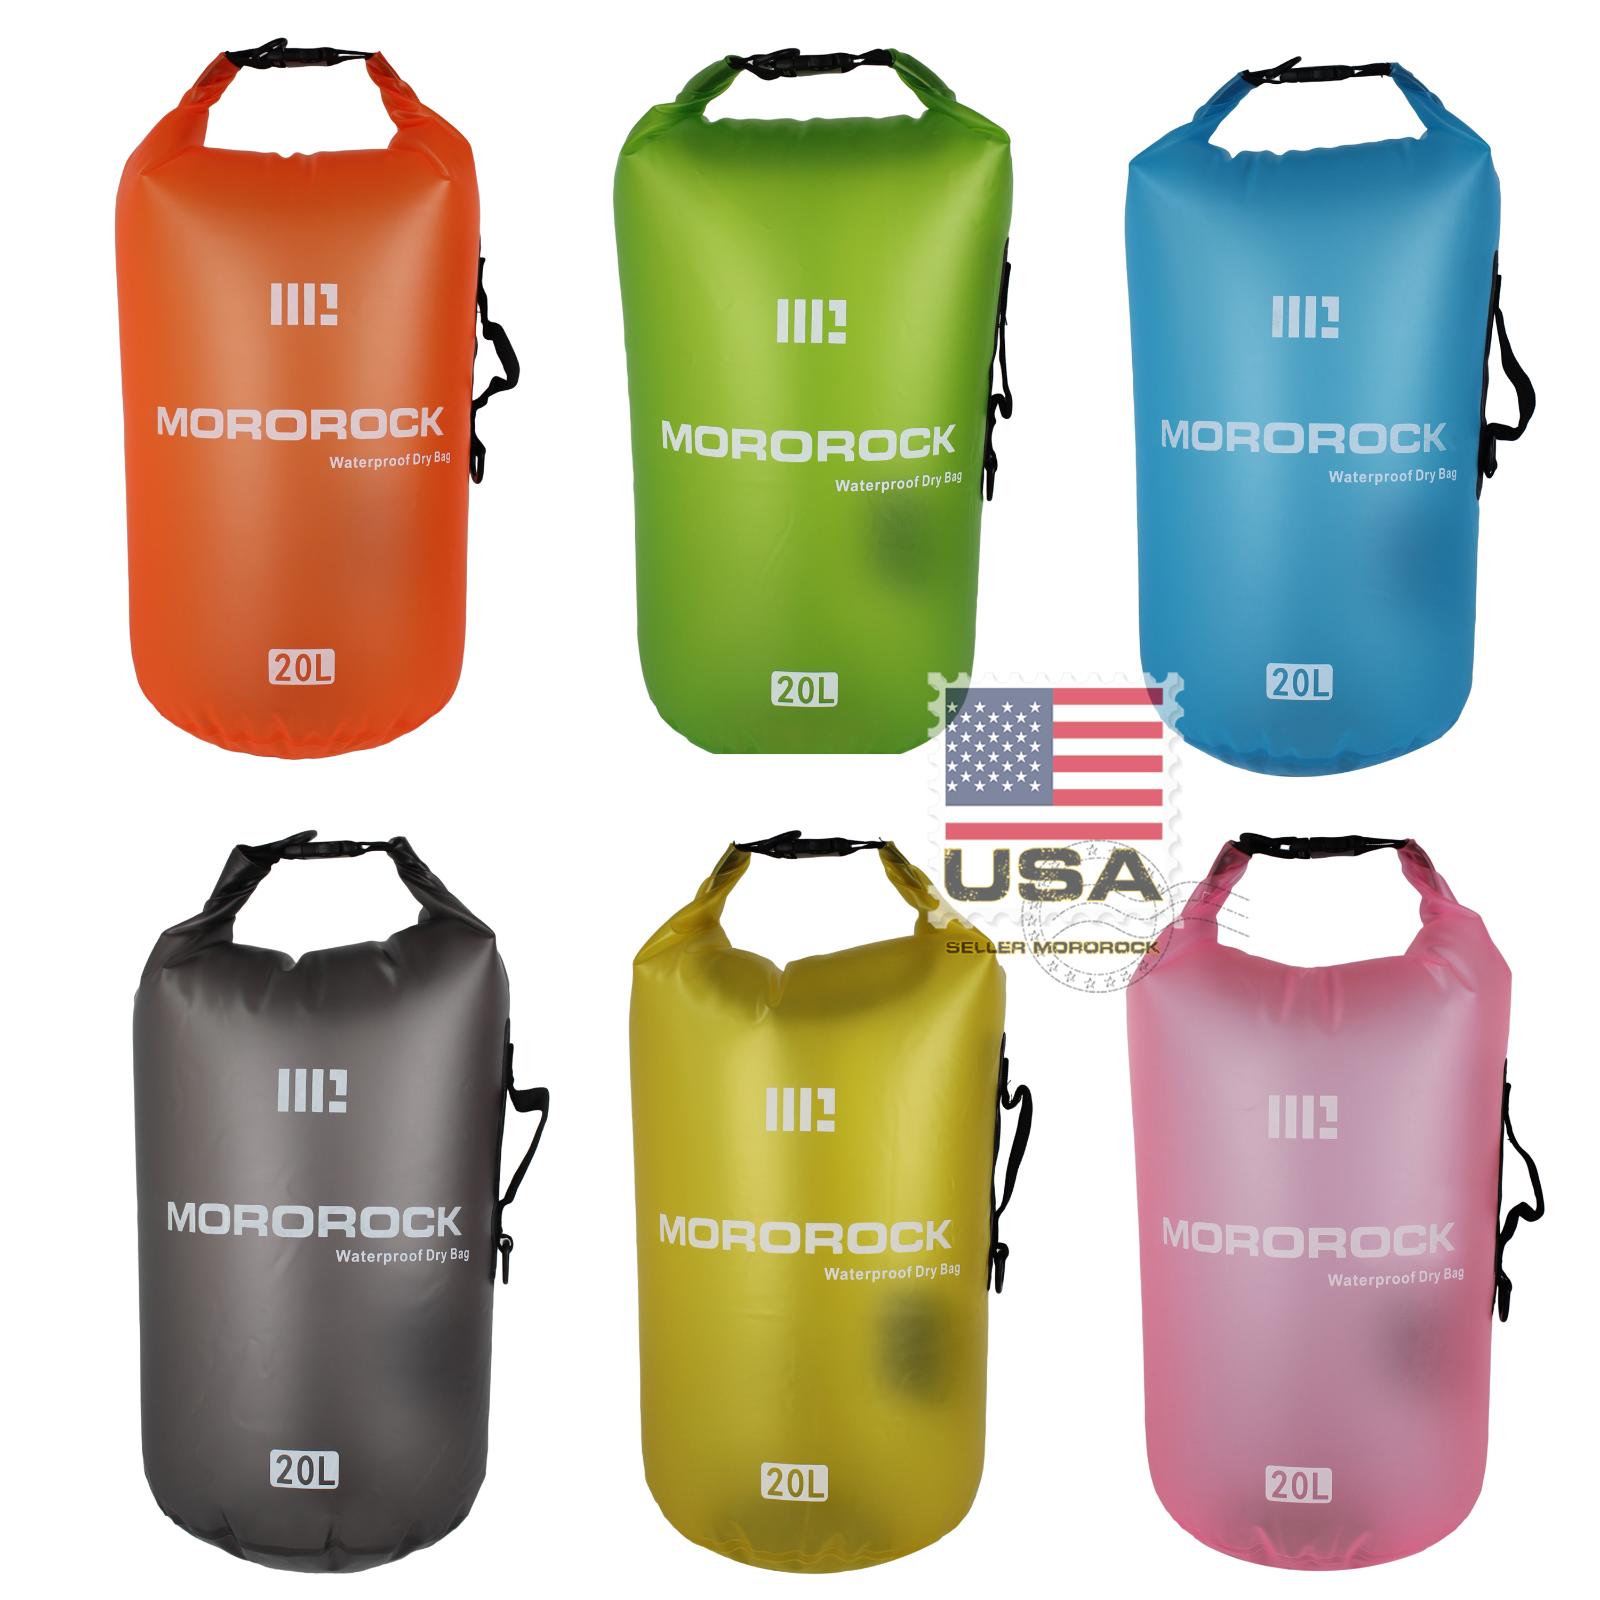 Mororock 10L 15L 20L Translucent PVC Fishing Boating Camping Waterproof Dry Bag